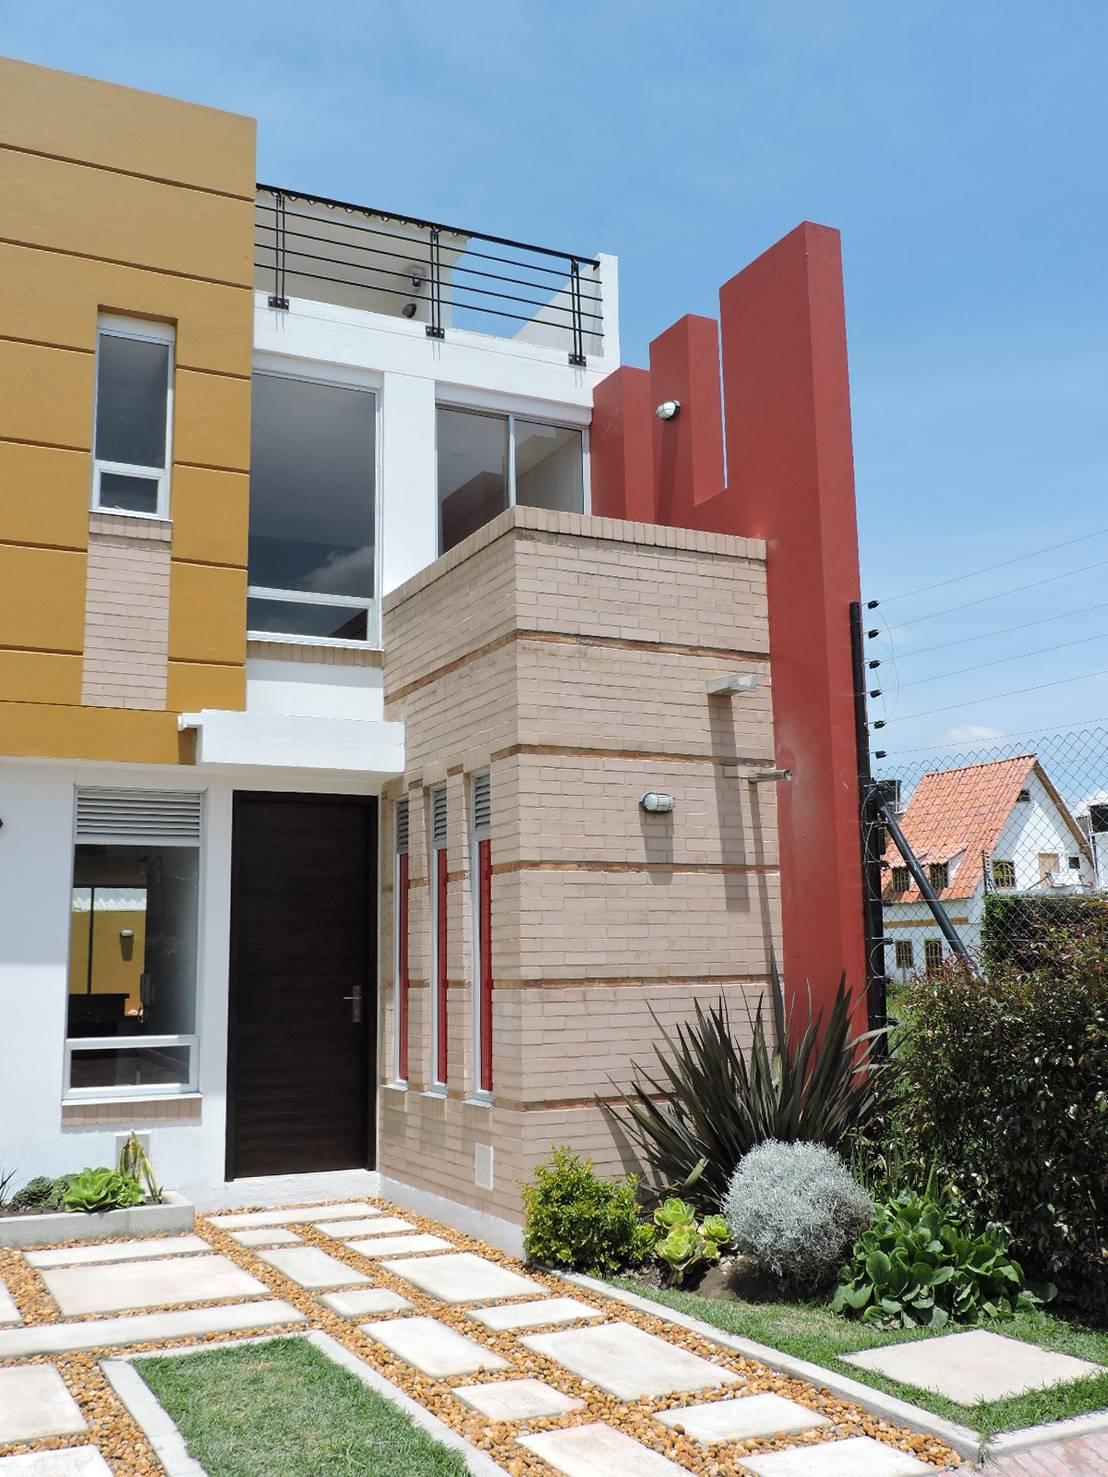 Casas conjunto terracota de dg arquitectura colombia homify for Homify casas